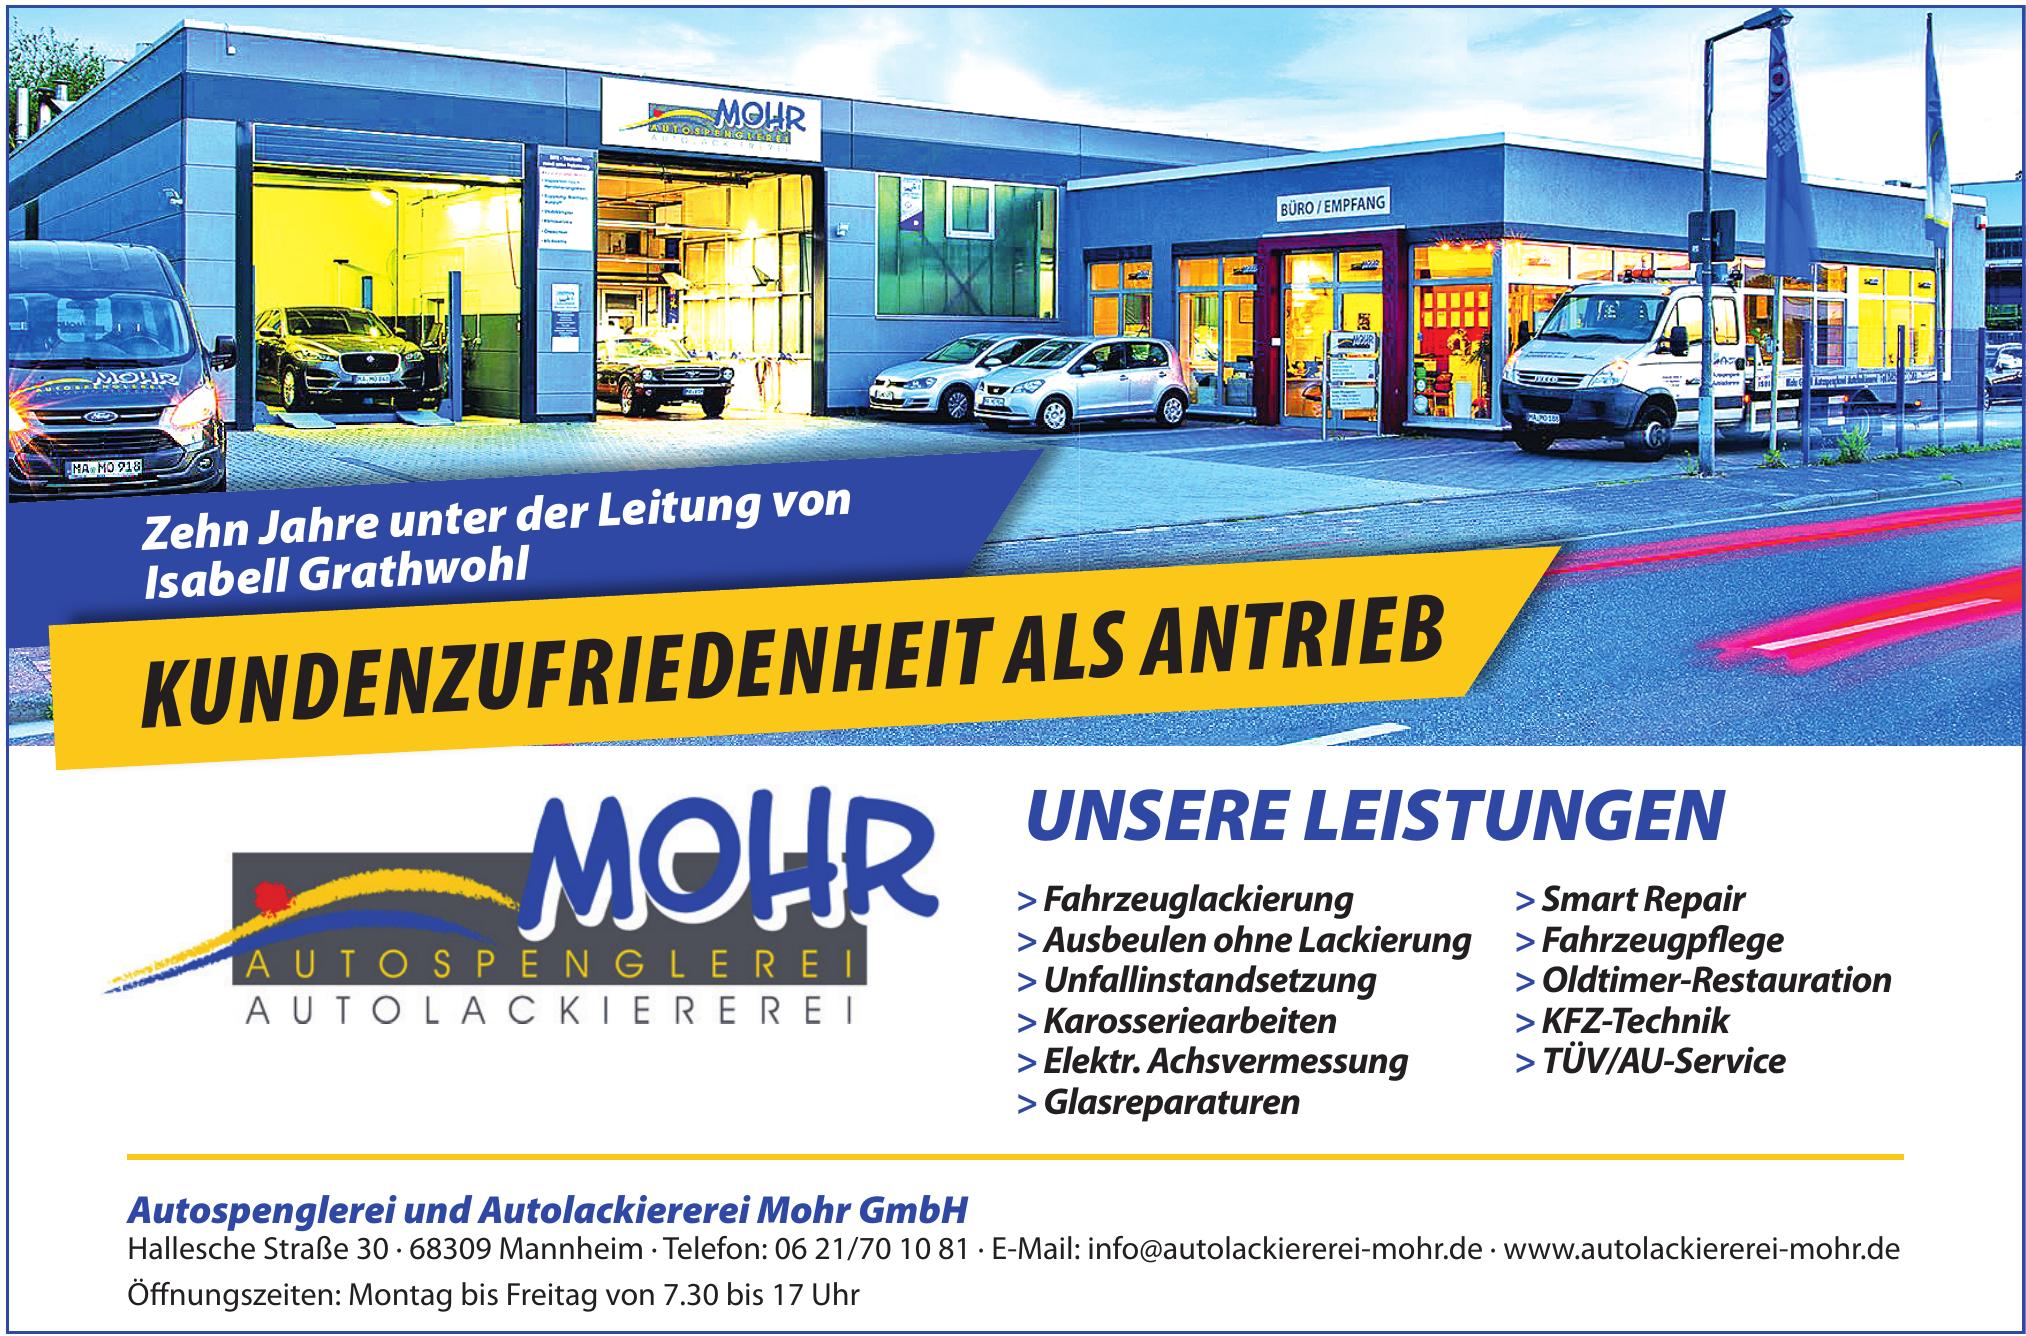 Autospenglerei und Autolackiererei Mohr GmbH